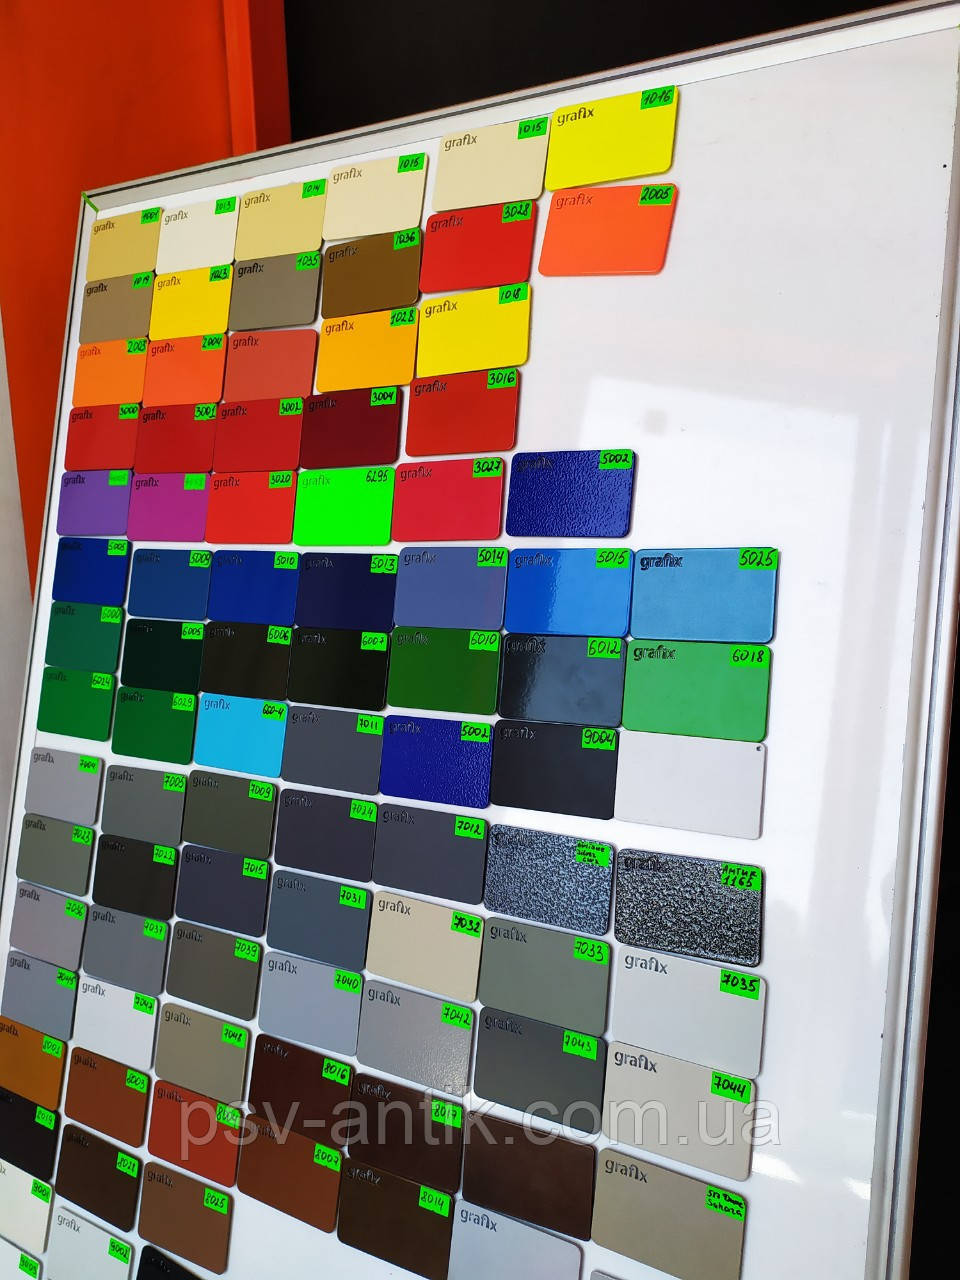 Порошковая краска глянцевая, полиэфирная, архитектурная, 6028